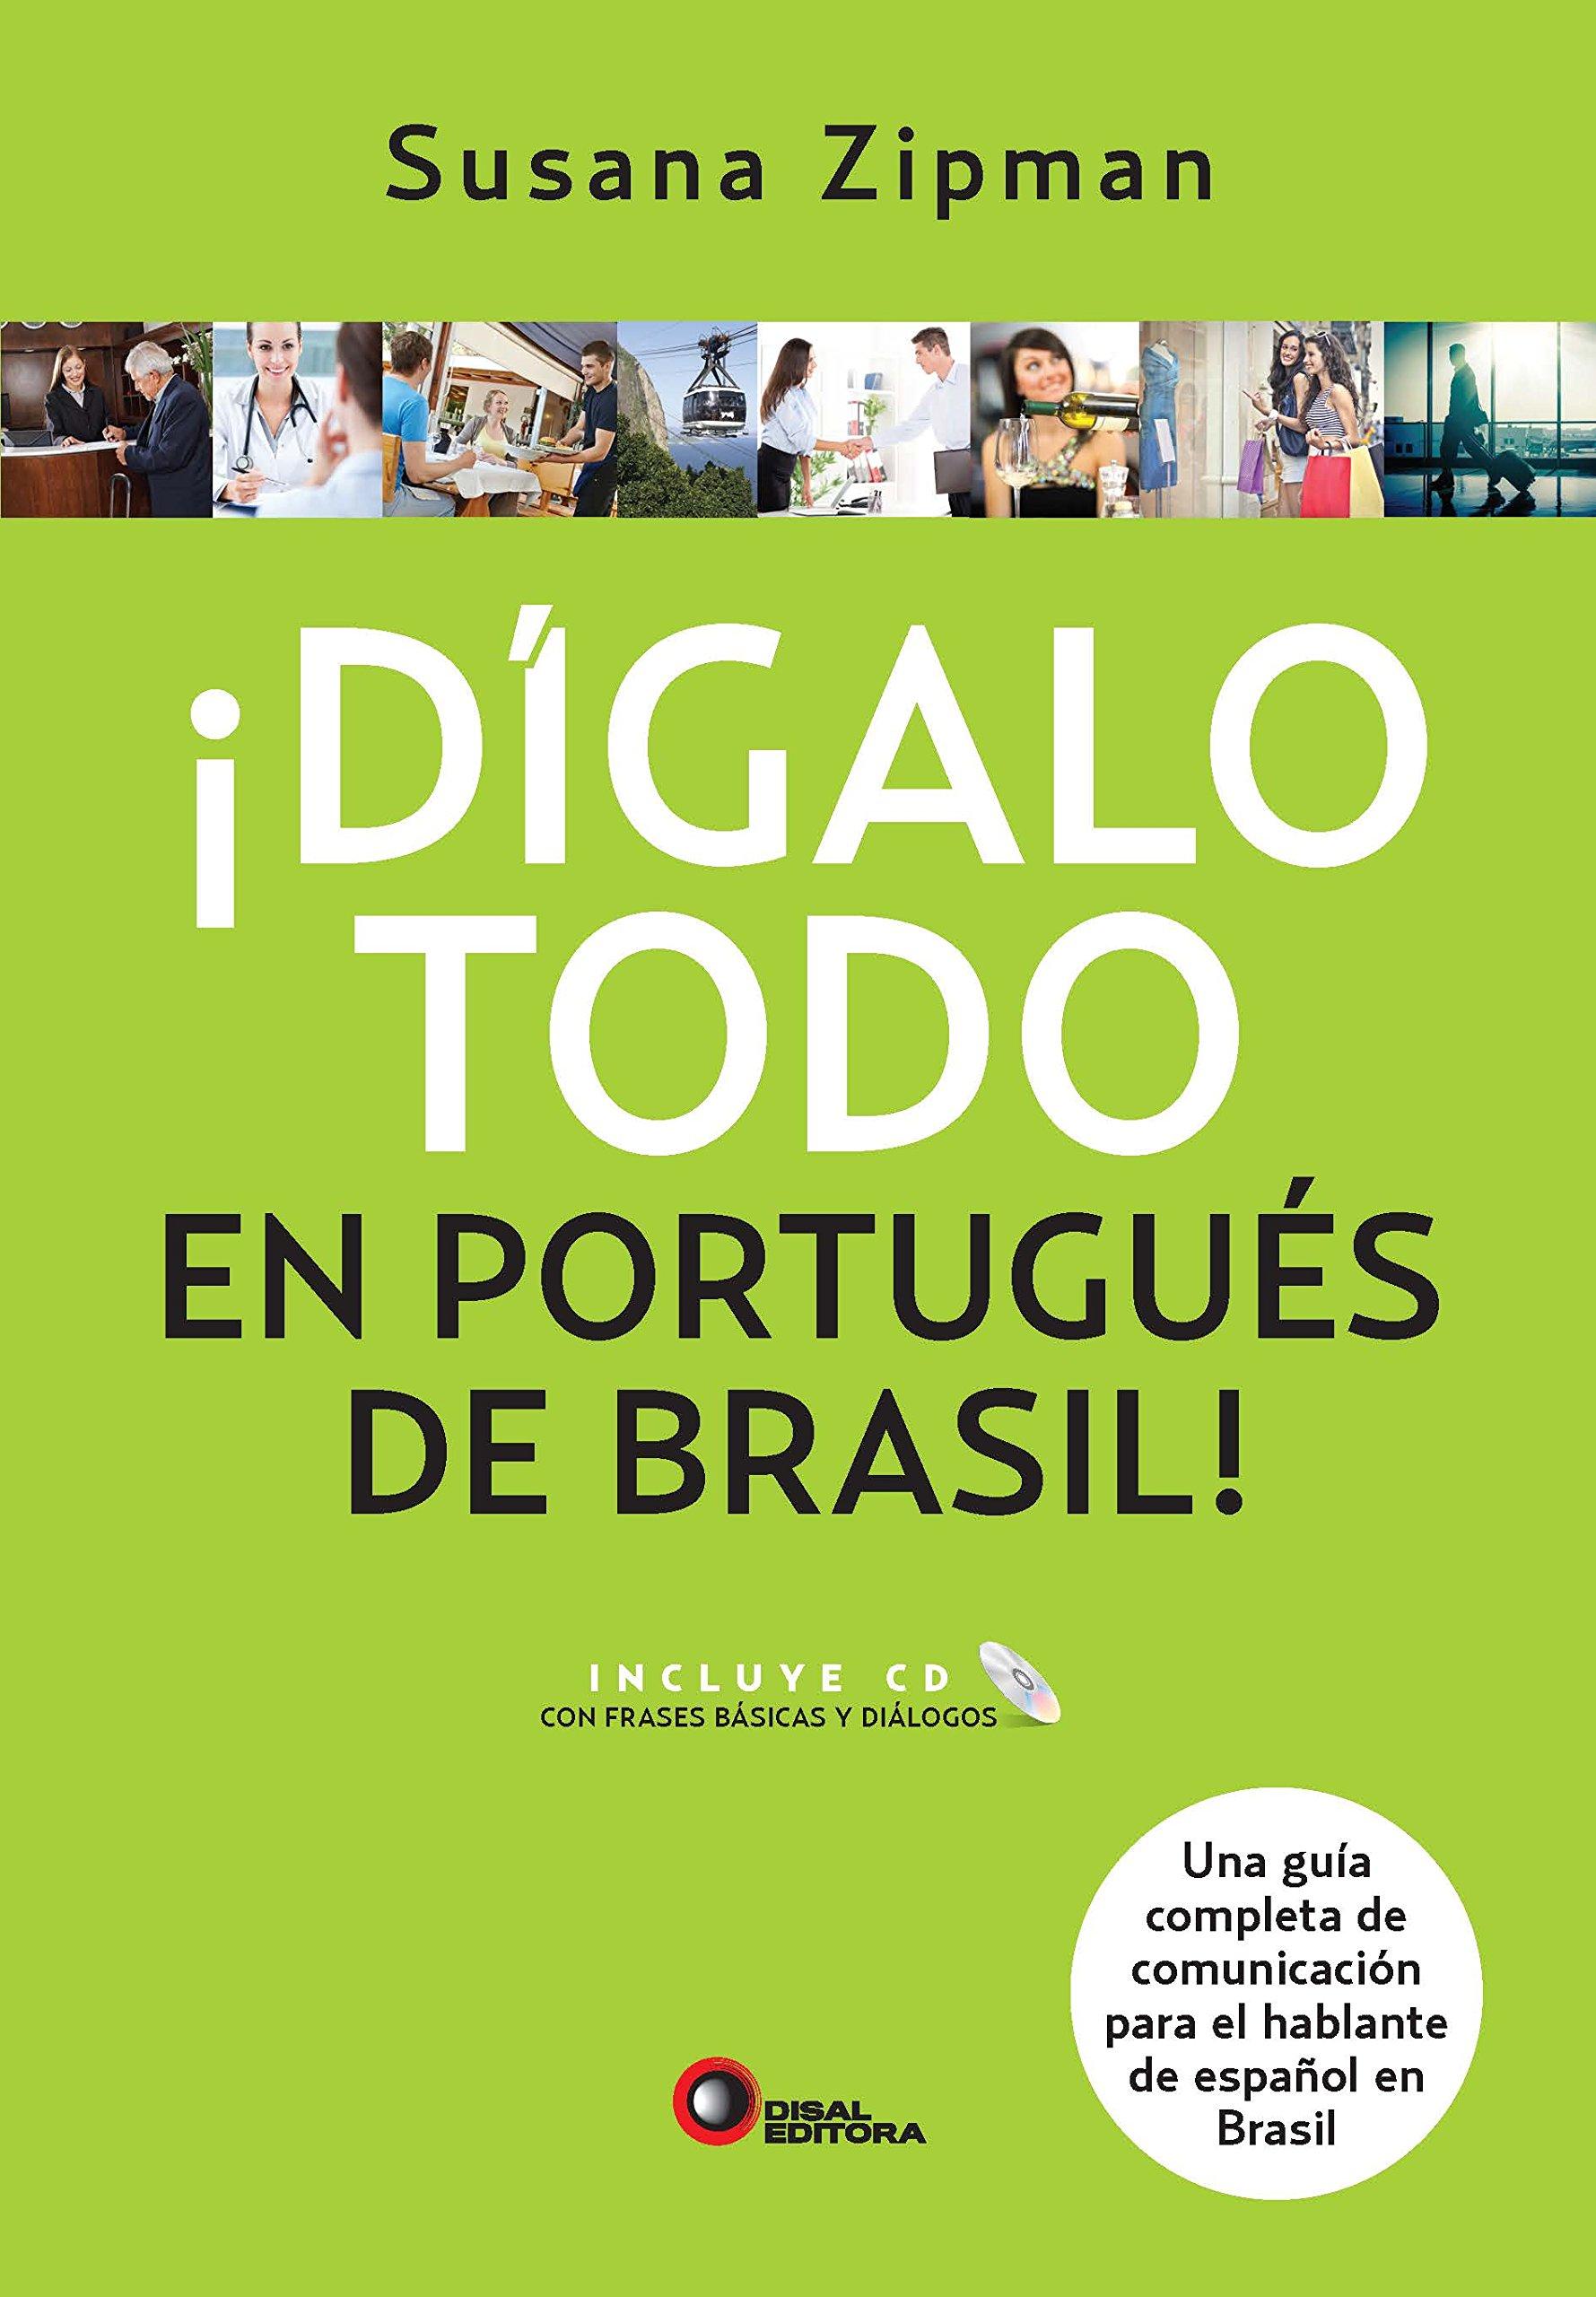 Dígalo Todo en Portugués de Brasil - Volume 1: Susana Zipman: 9788578441753: Amazon.com: Books